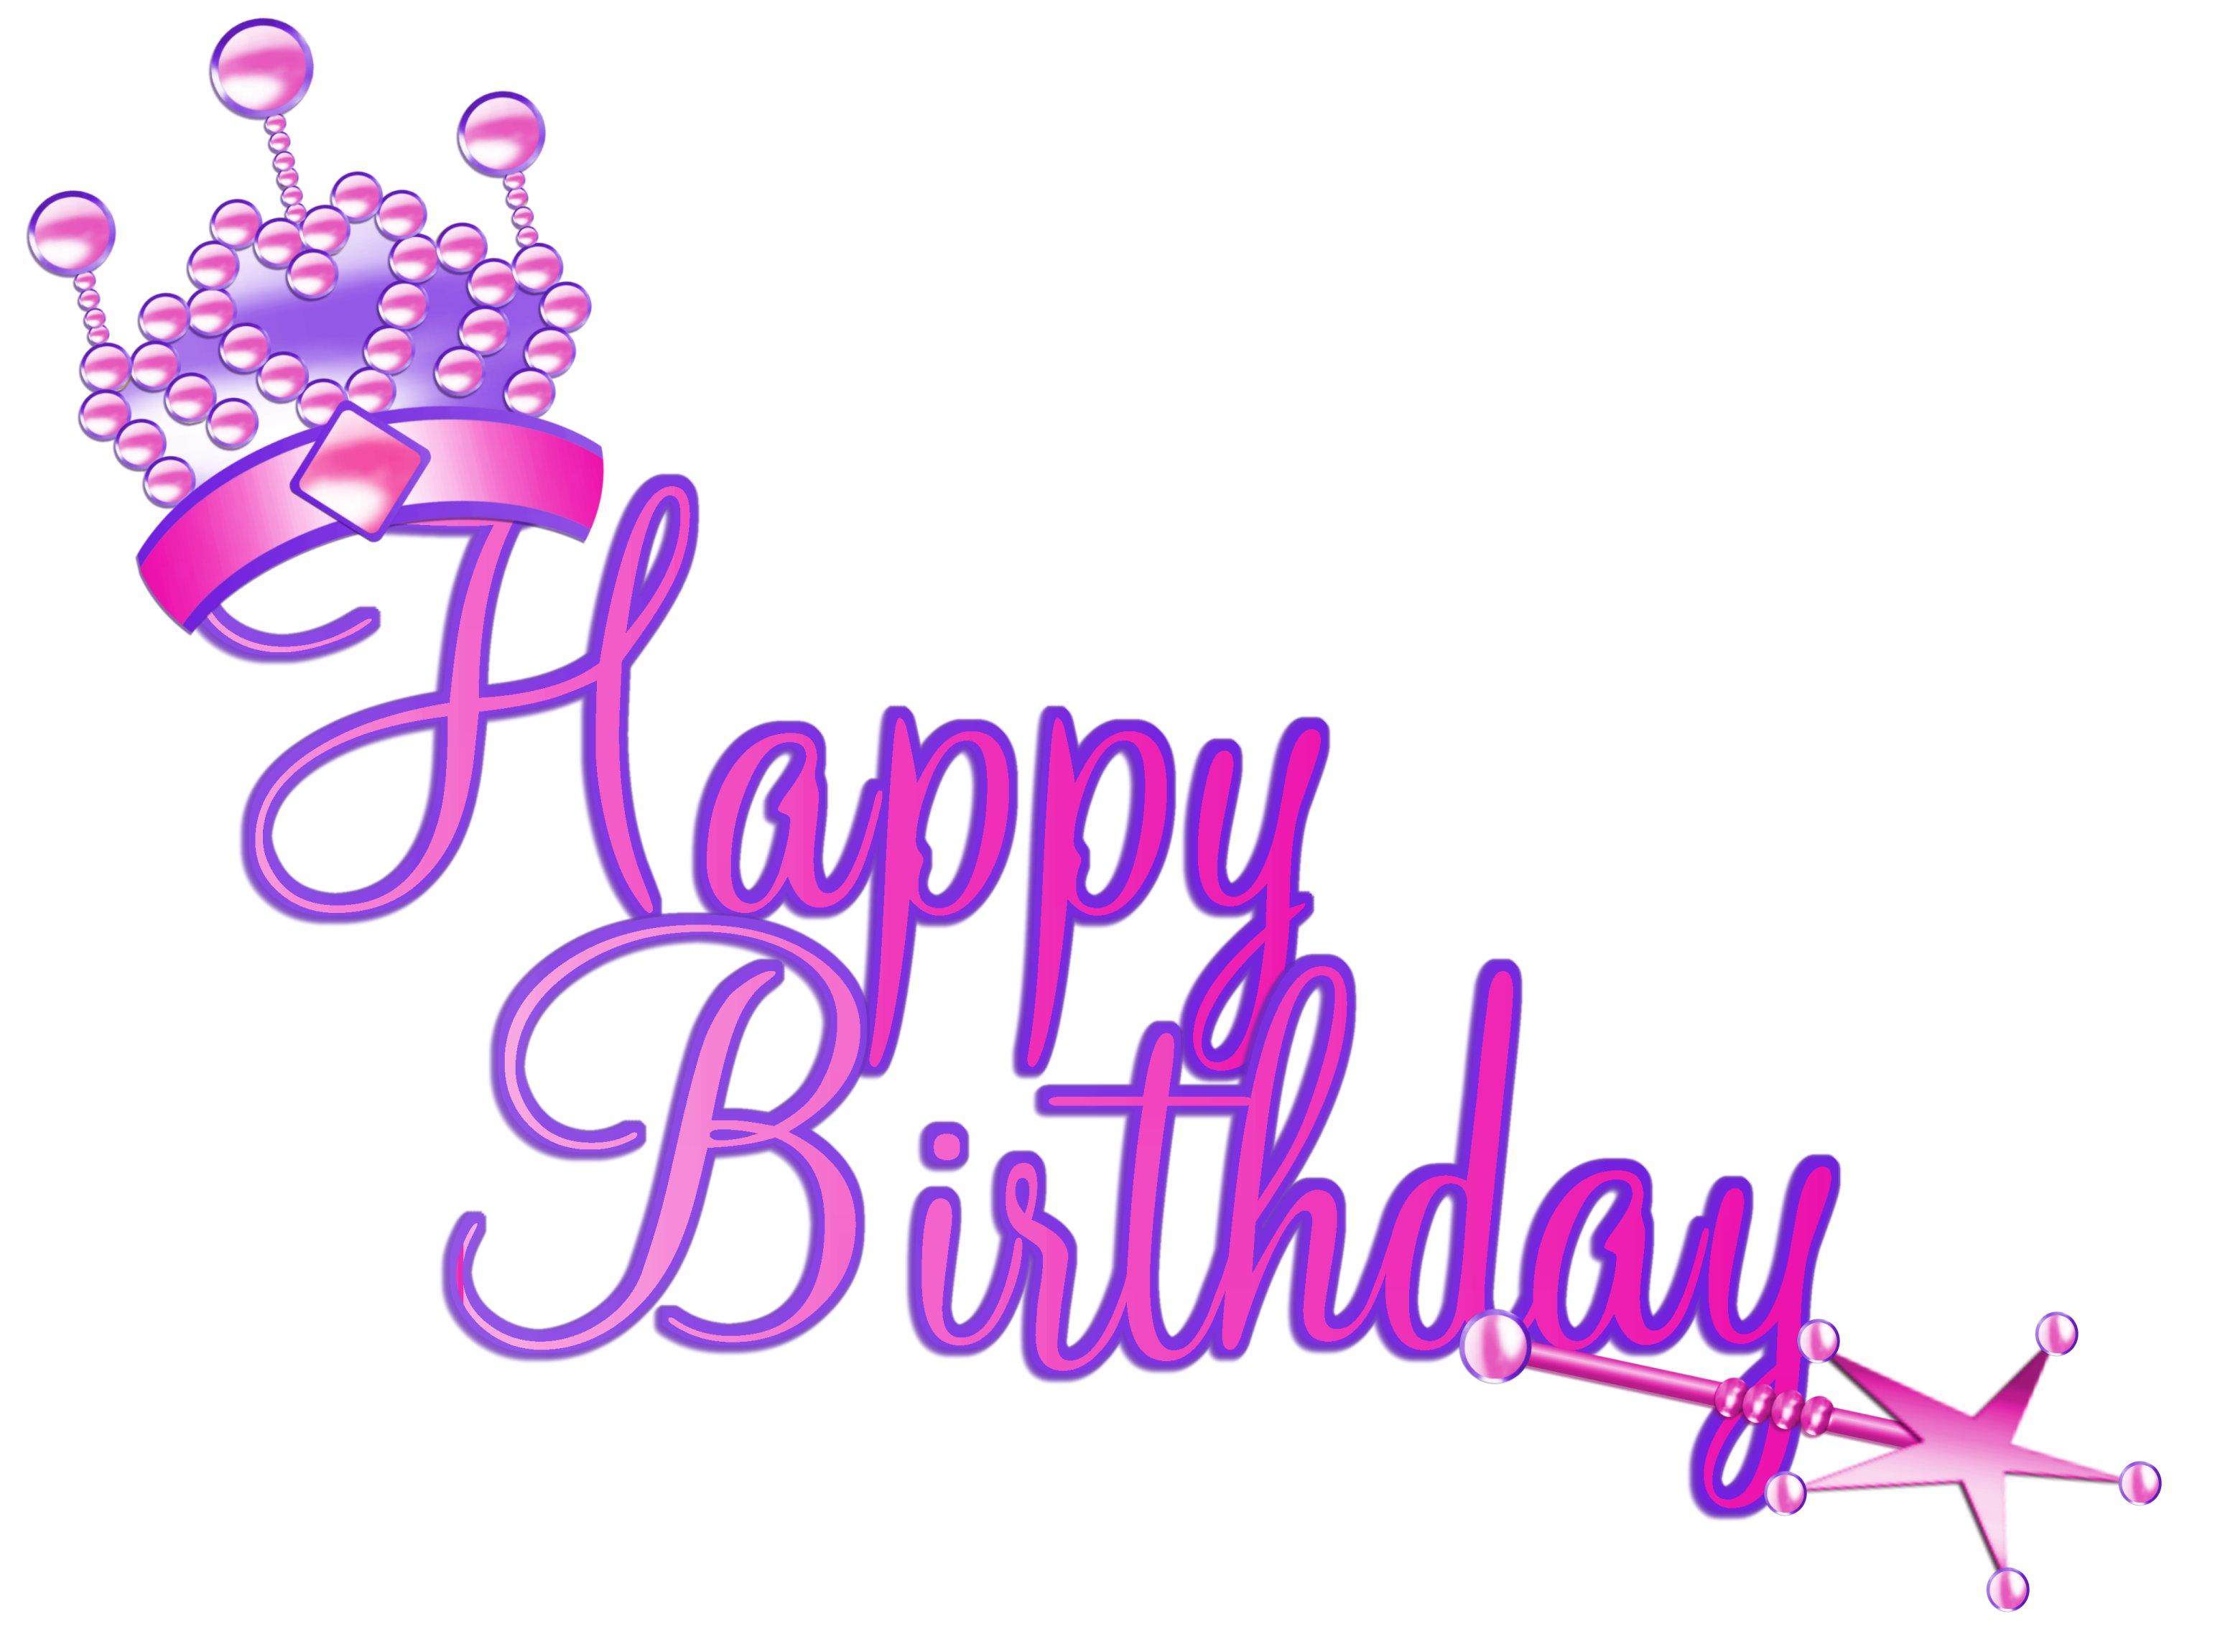 Sofia clipart happy birthday Birthday  Glamorous Birthday creation